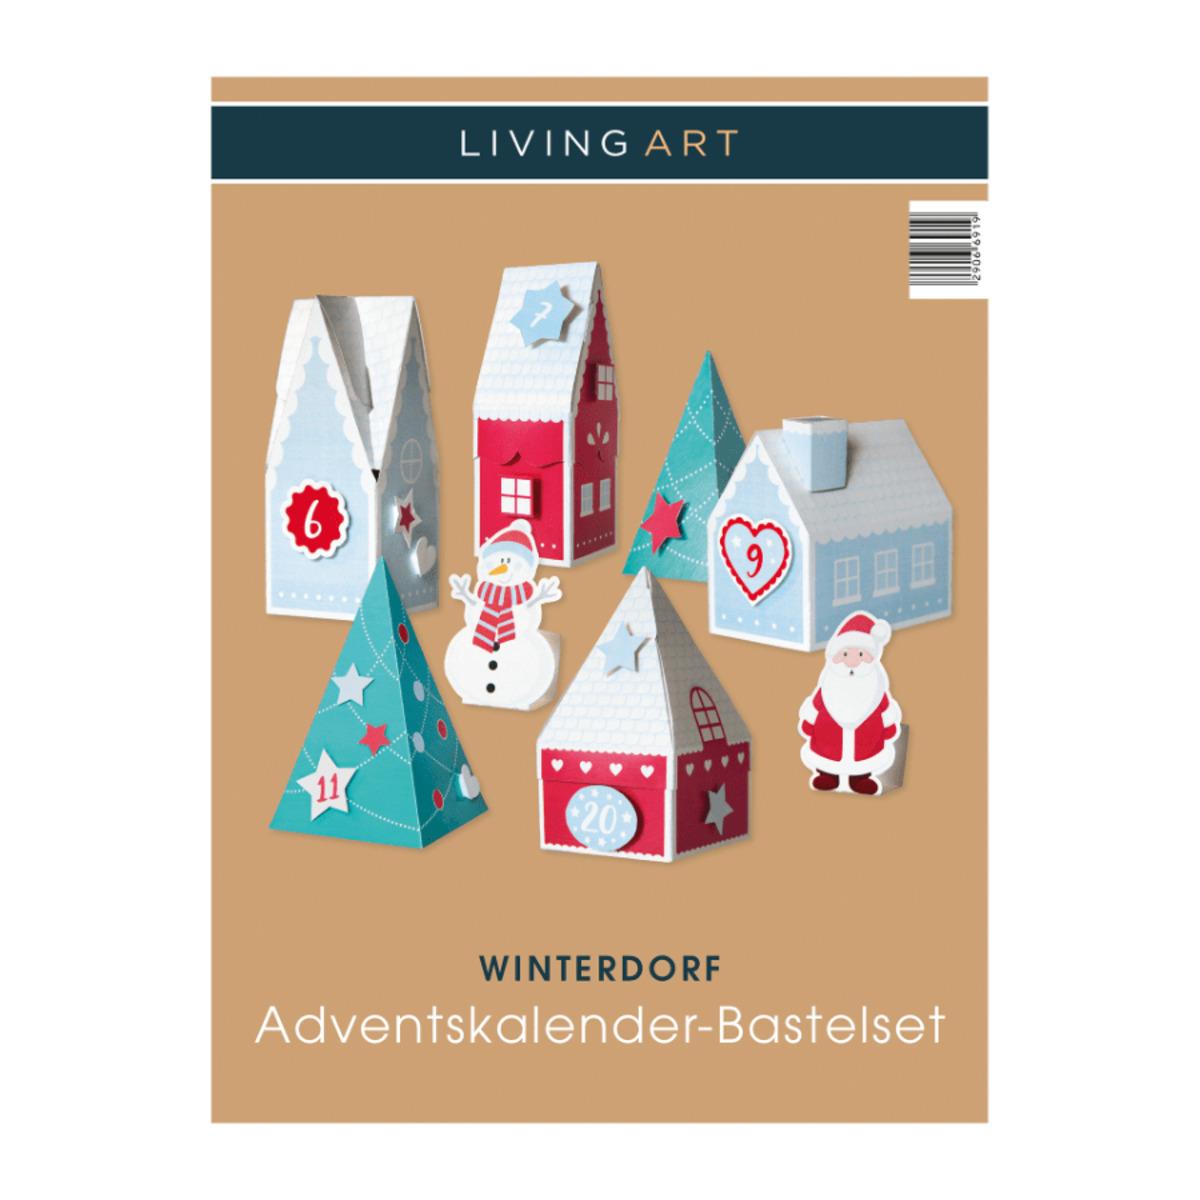 Bild 3 von LIVING ART     Adventskalender-Bastelset